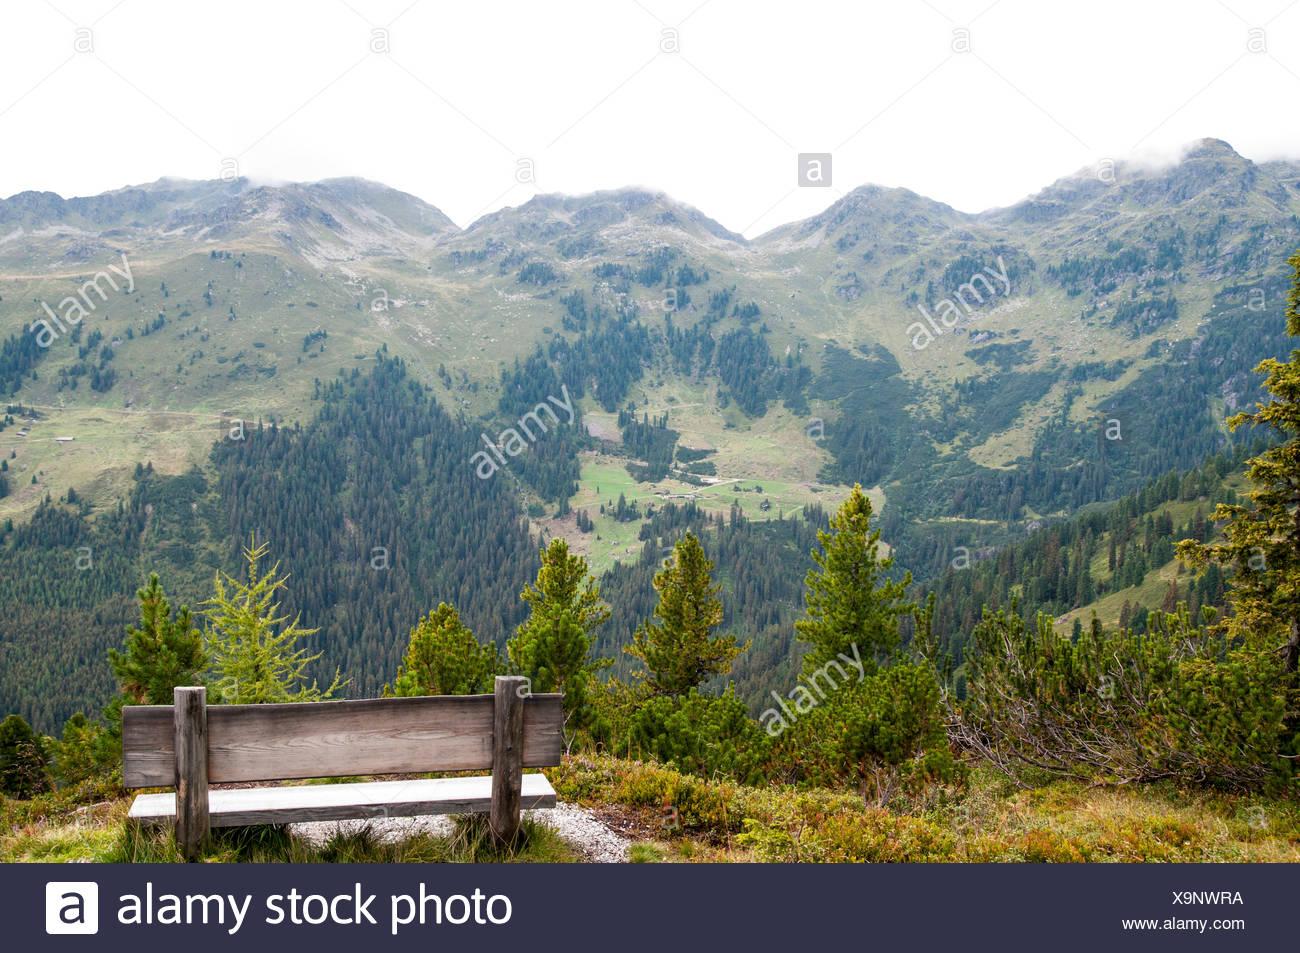 Isskogel mountain peak near Gerlos, Tyrol, Austria Stock Photo